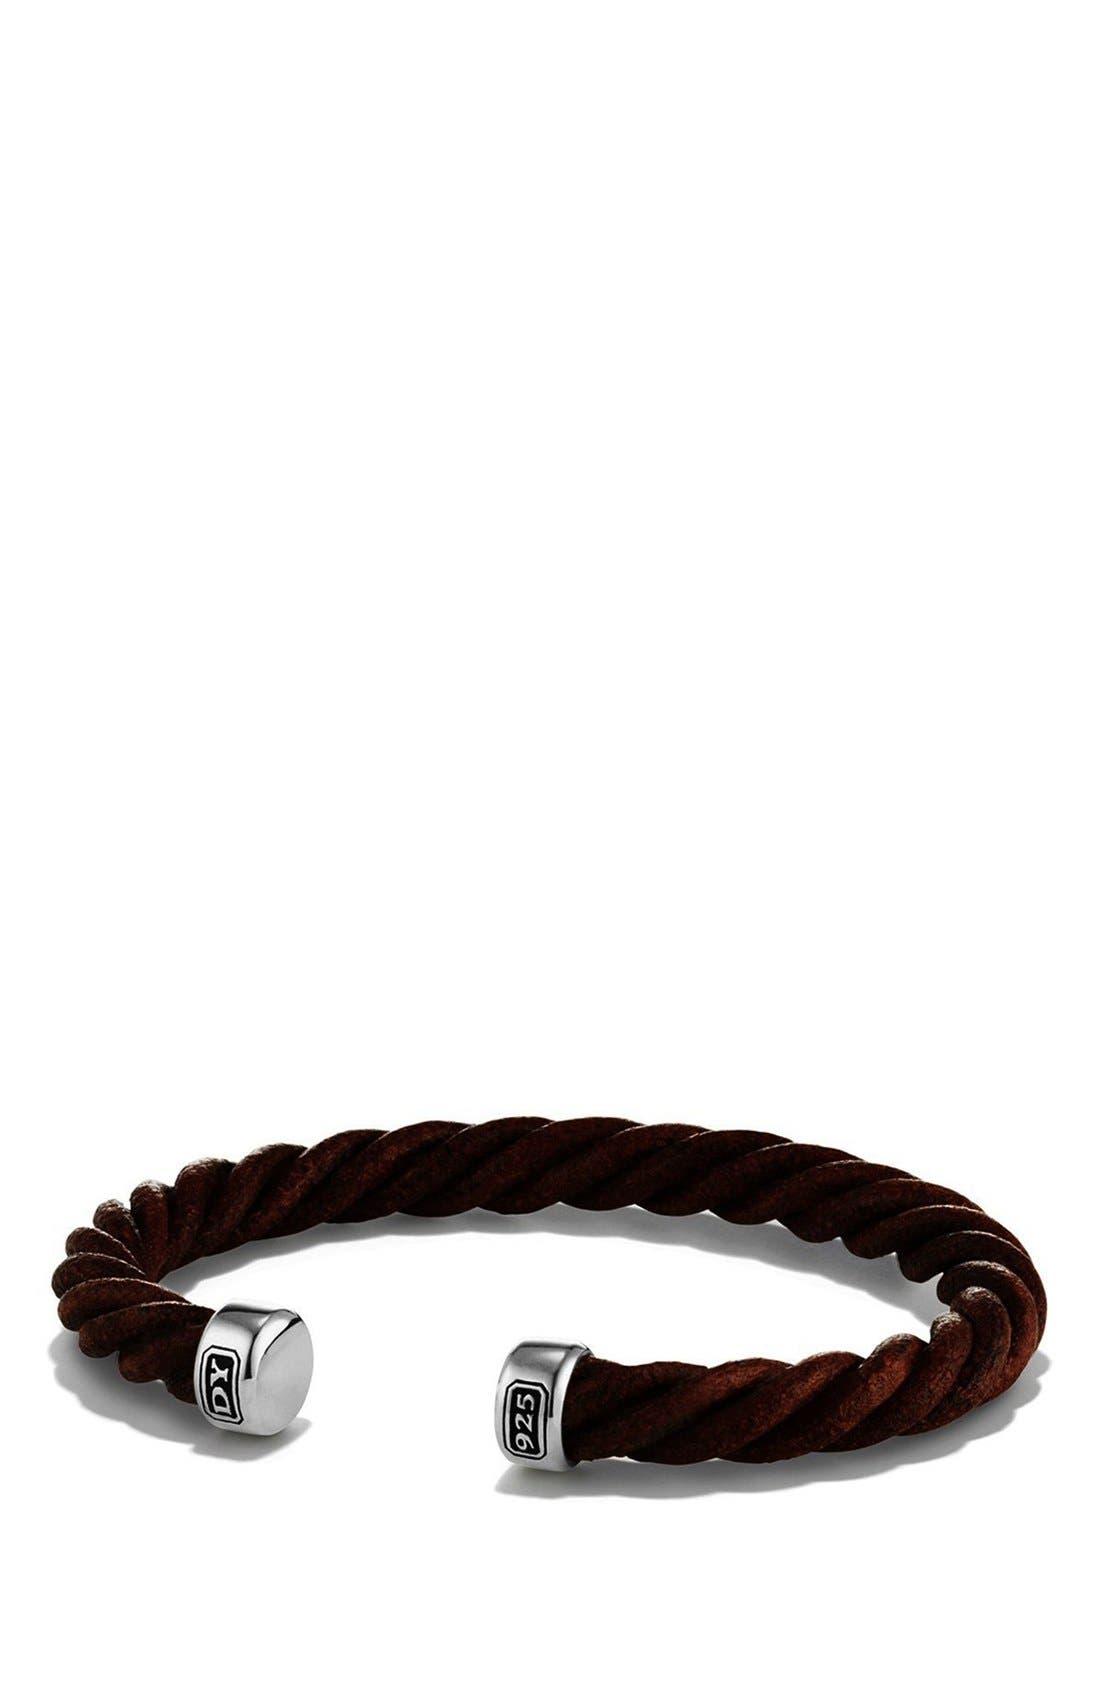 David Yurman Leather Cuff Bracelet